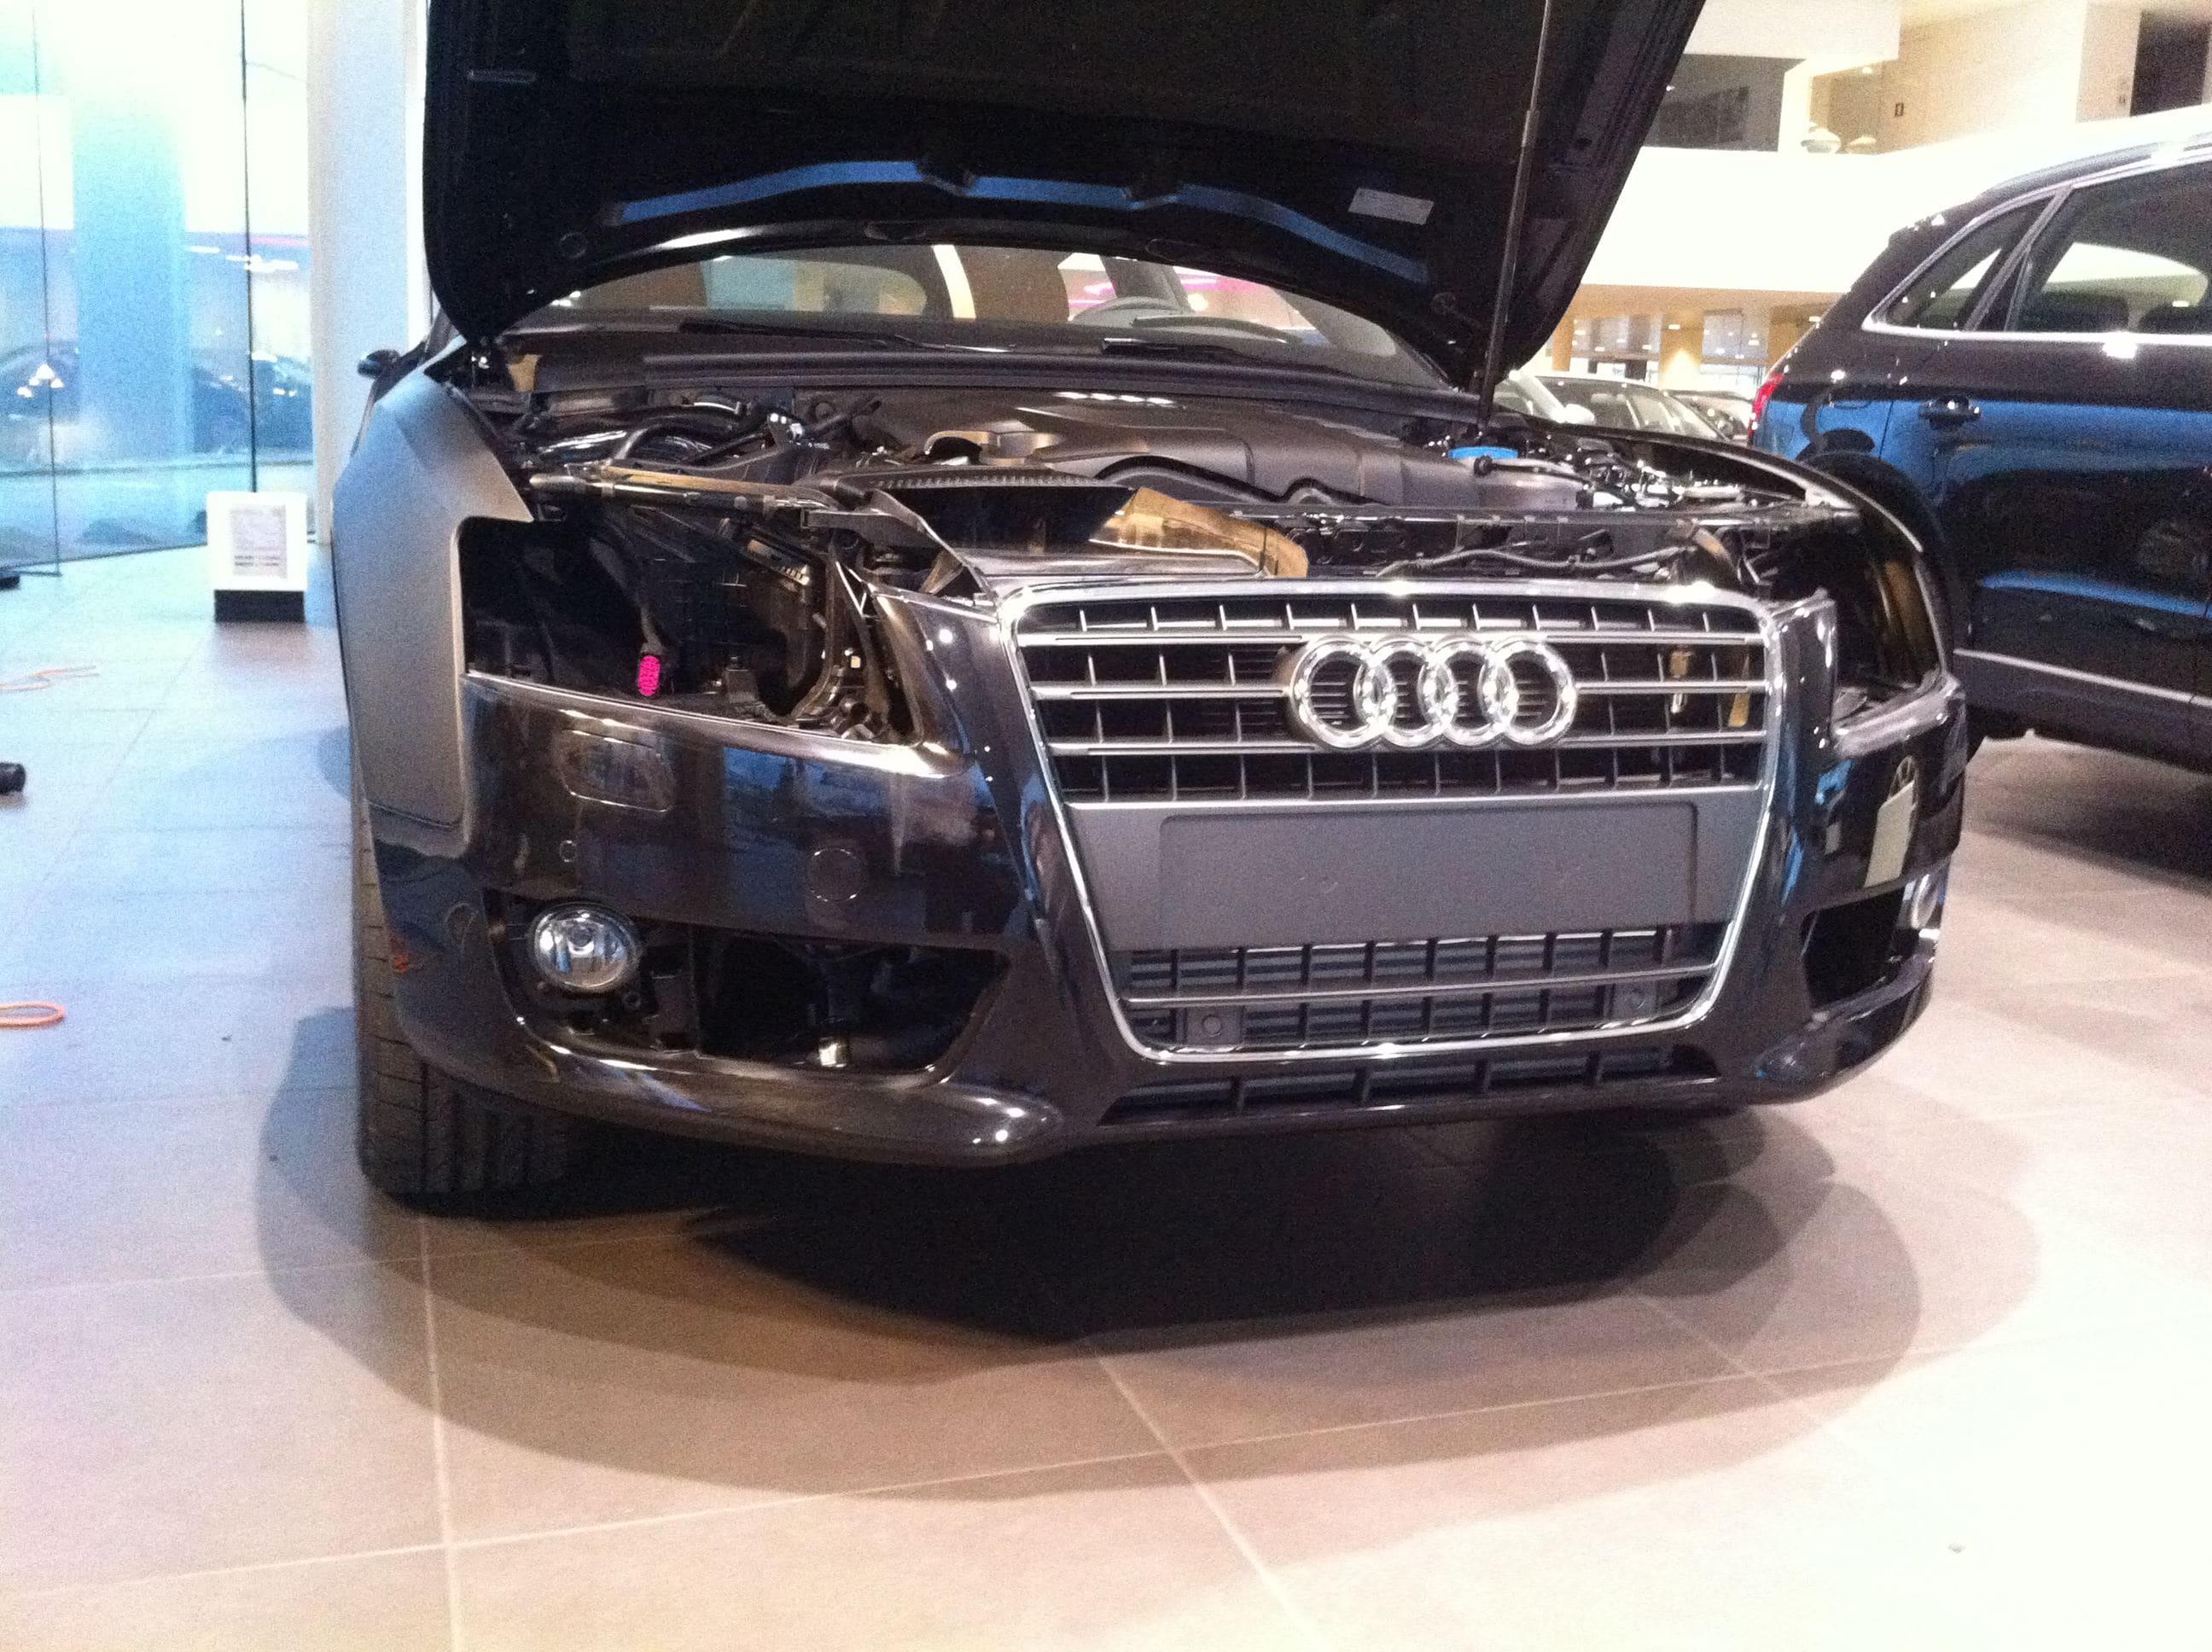 Audi A5 Sportback met Mat Grijze Wrap, Carwrapping door Wrapmyride.nu Foto-nr:4767, ©2021